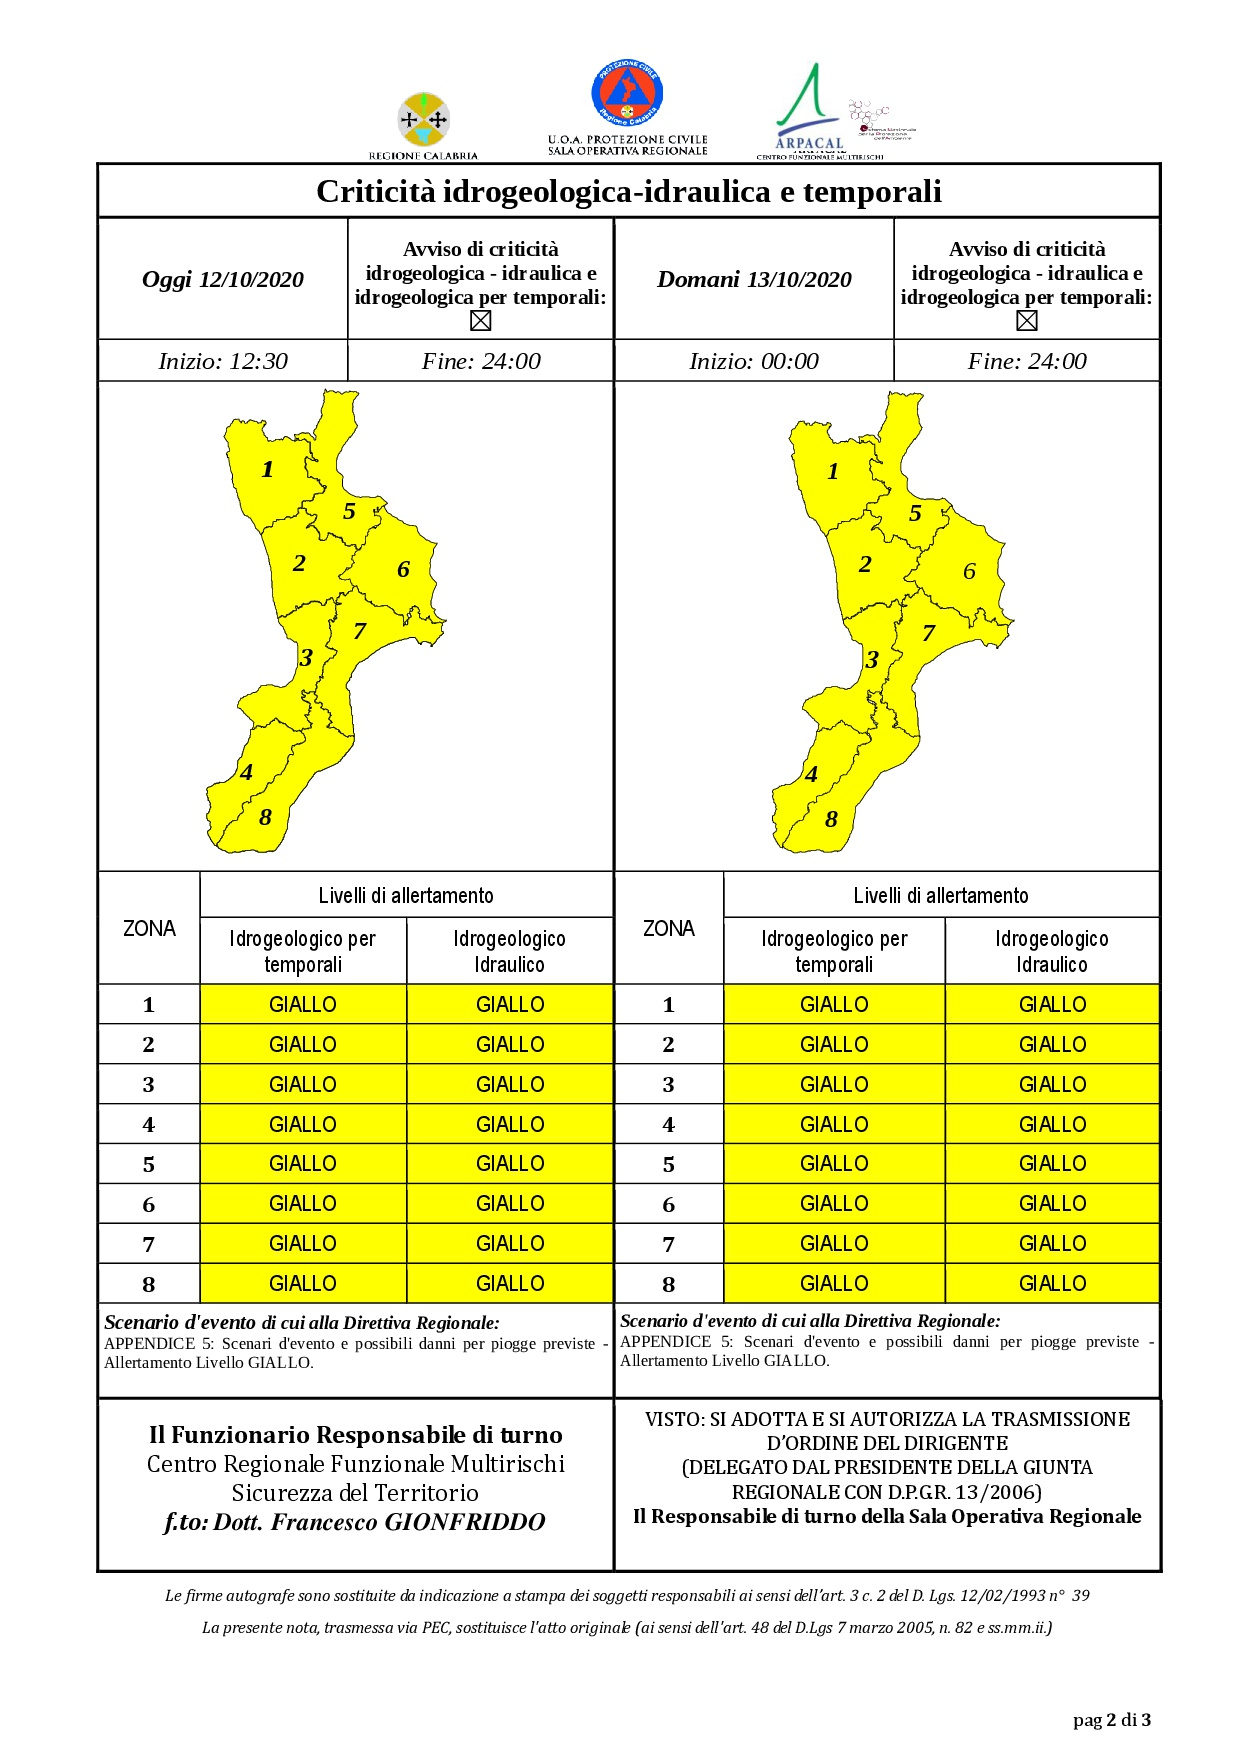 Criticità idrogeologica-idraulica e temporali in Calabria 12-10-2020